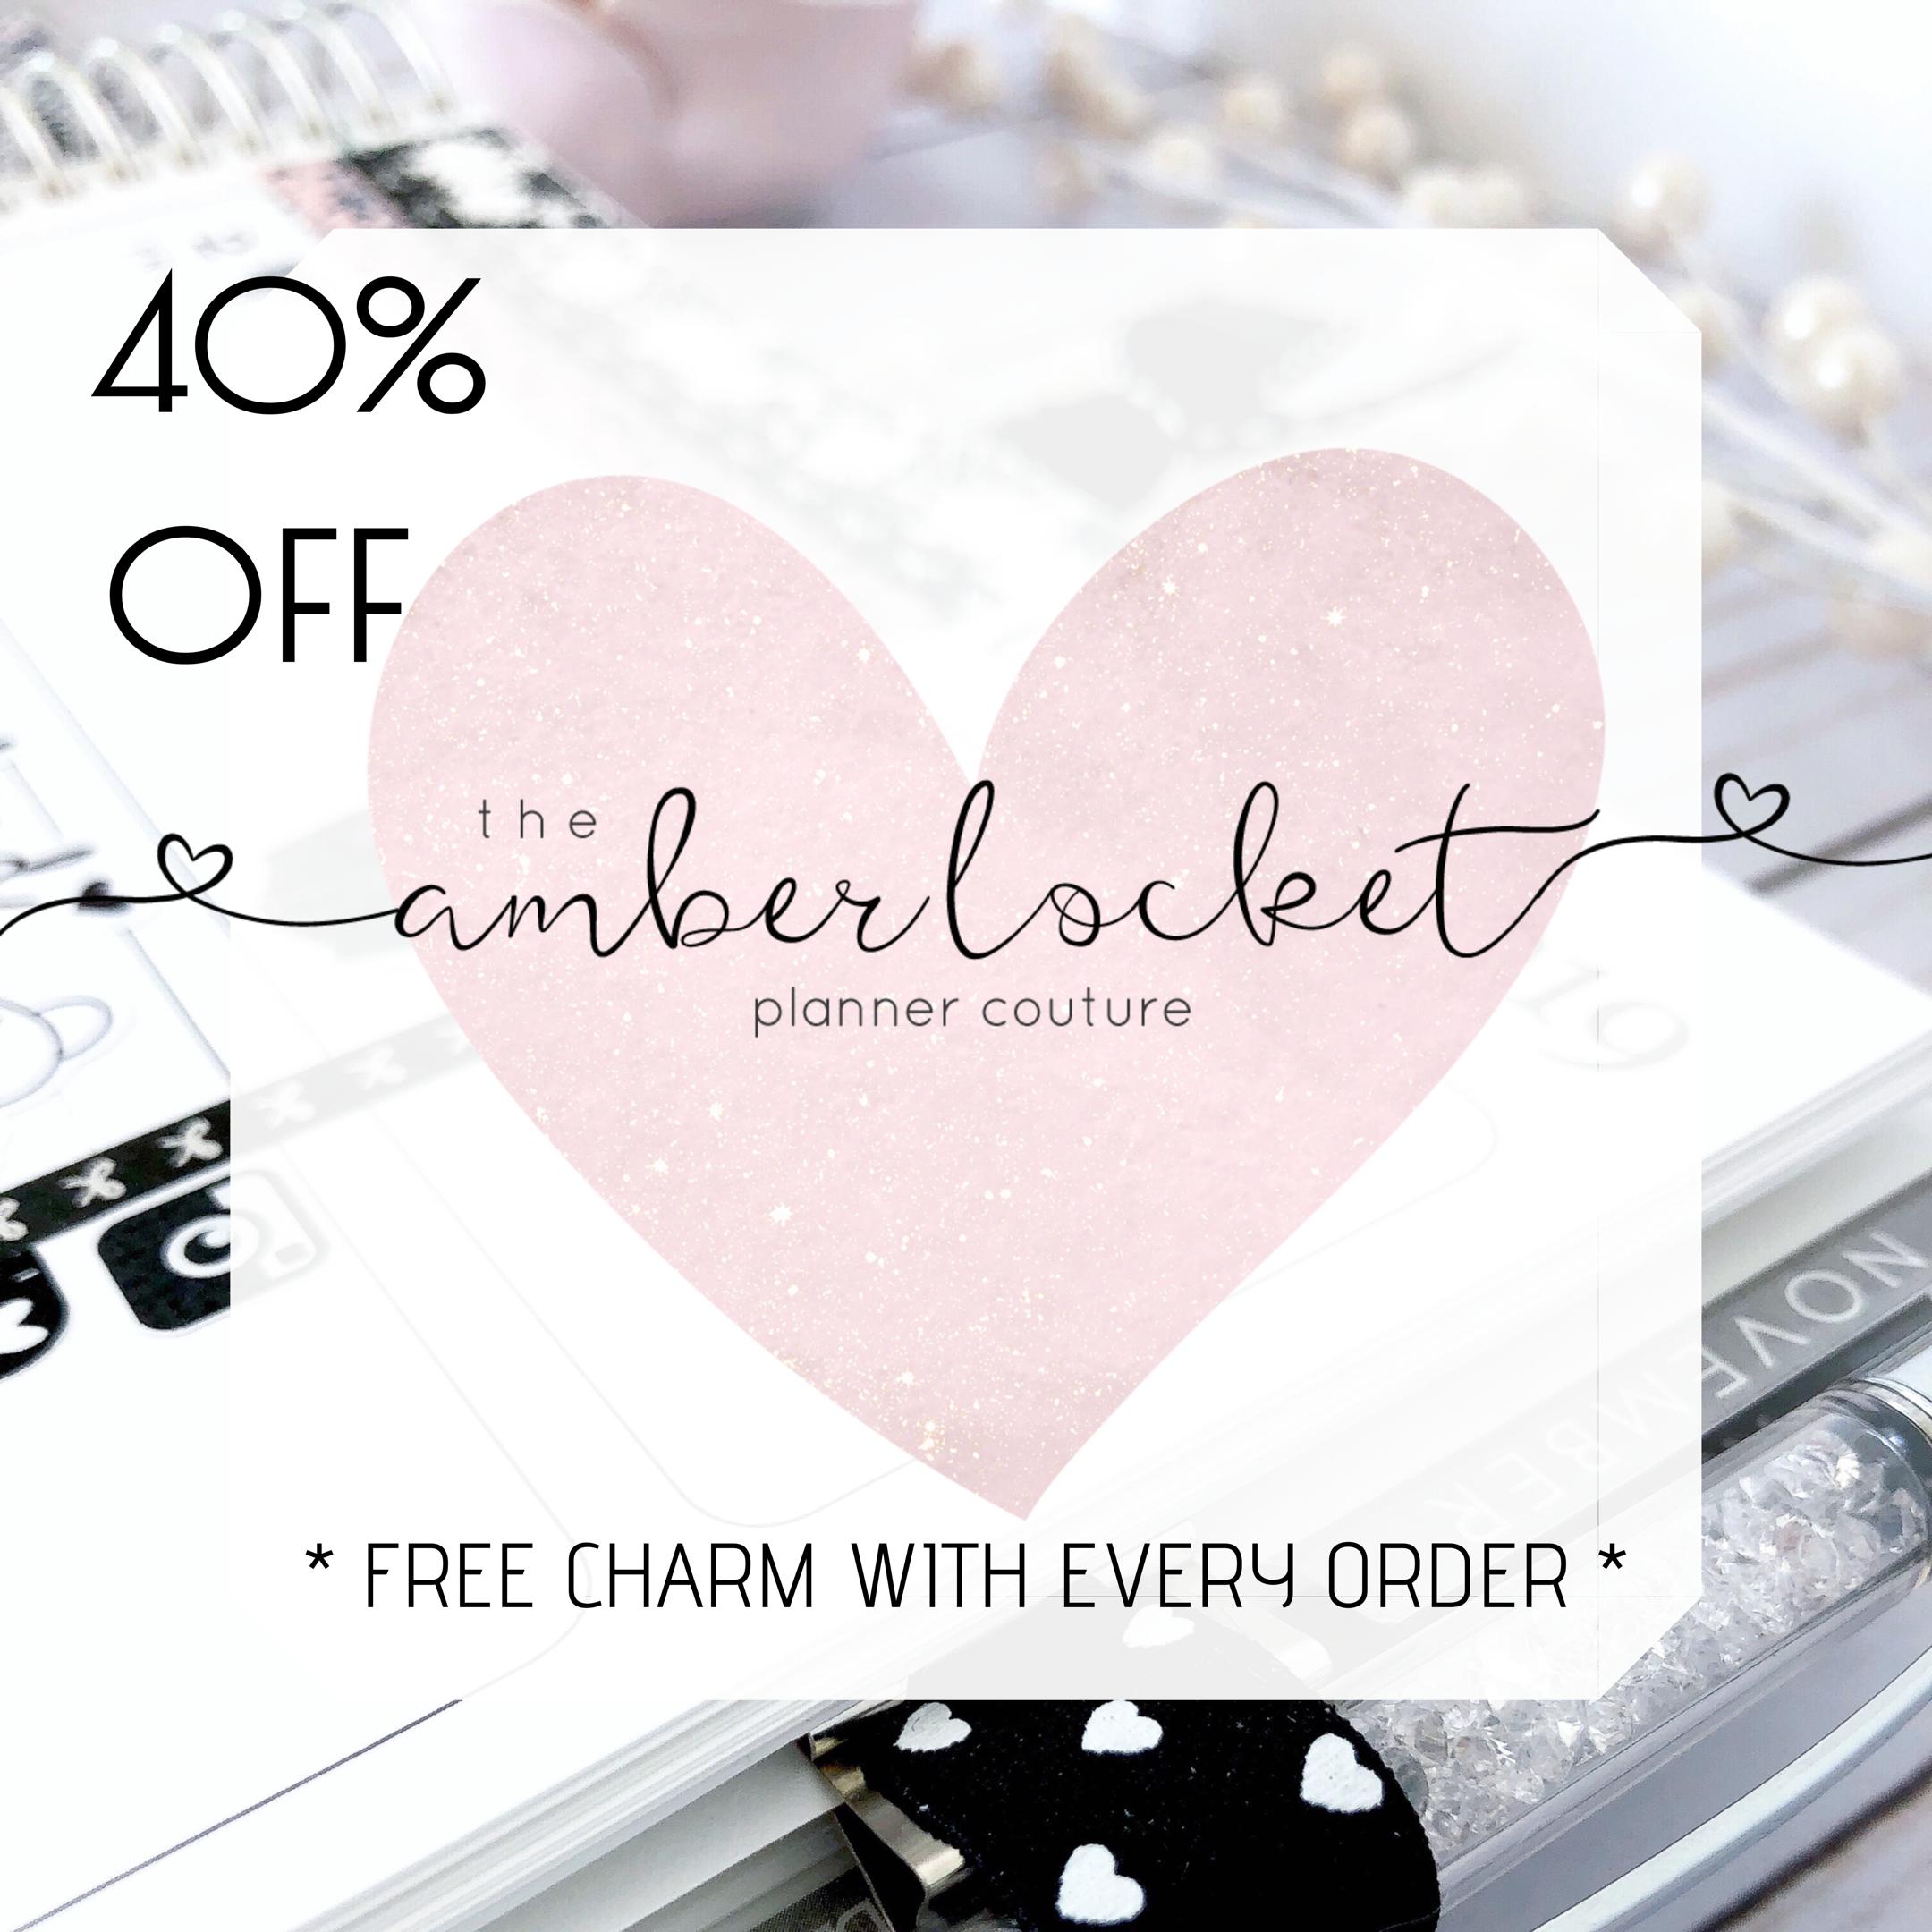 The Amber Locket